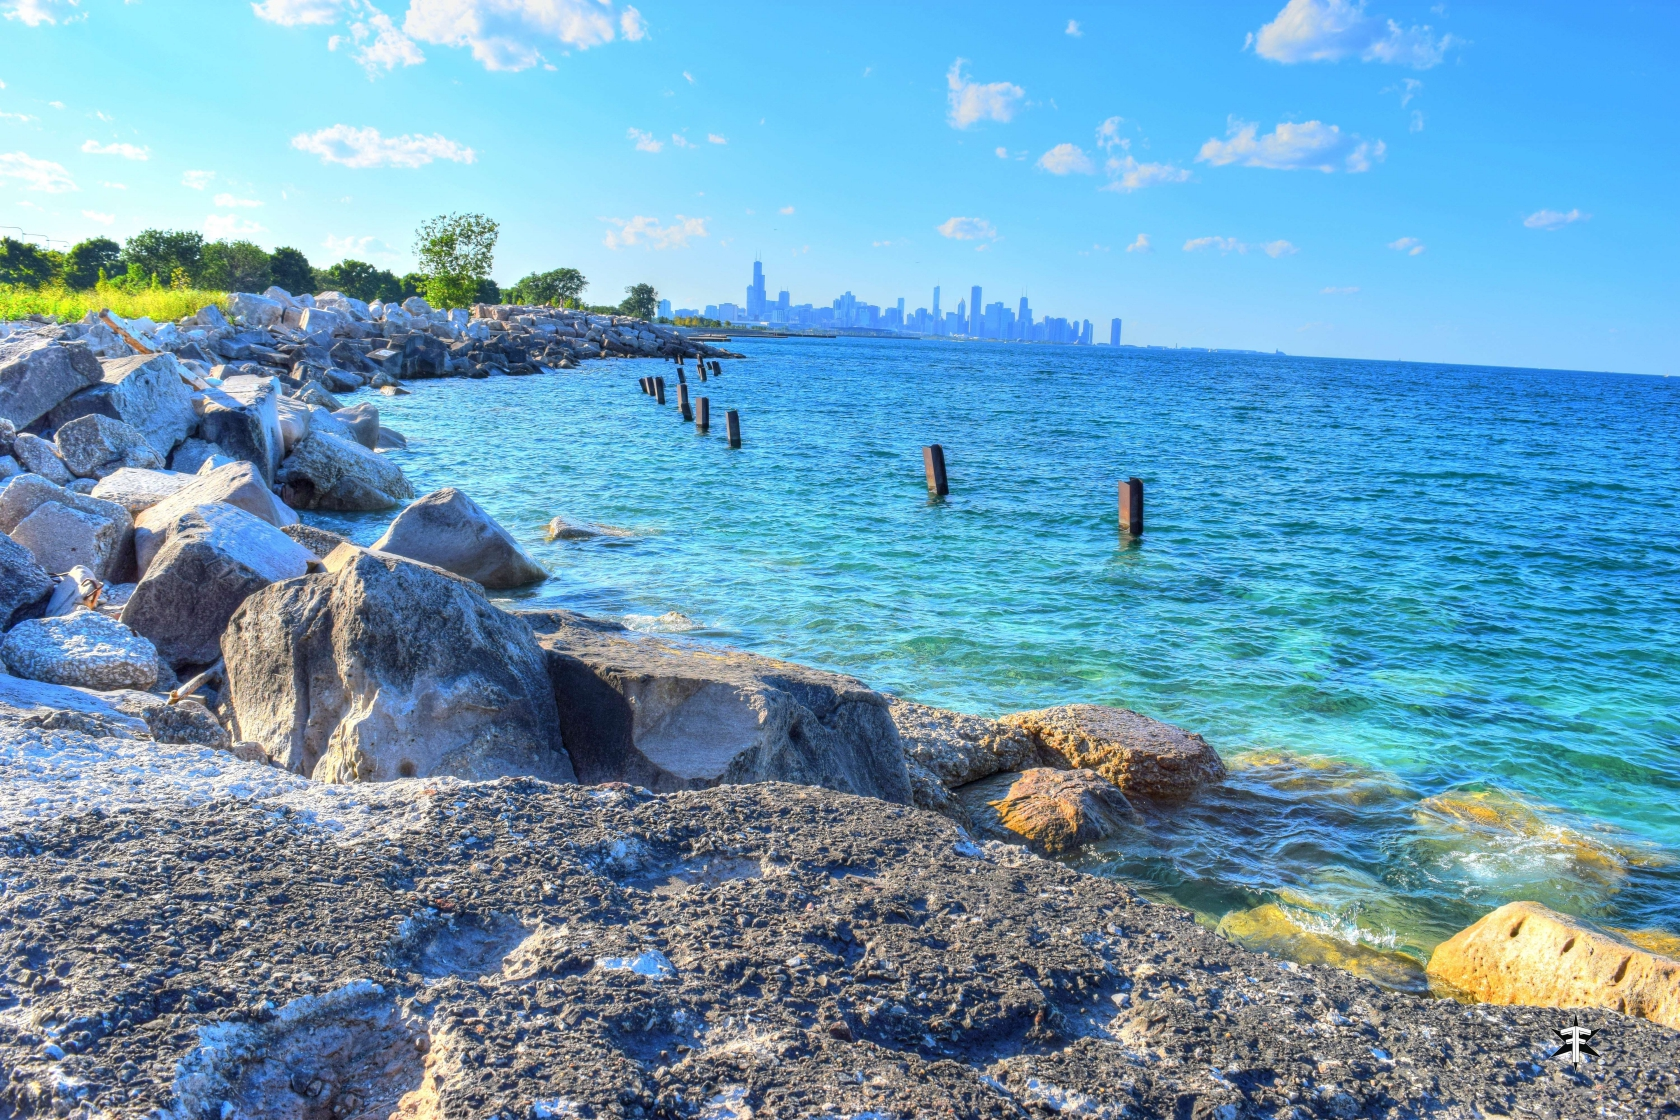 batch_chicago lake michigan skyline water colorful normal.jpg